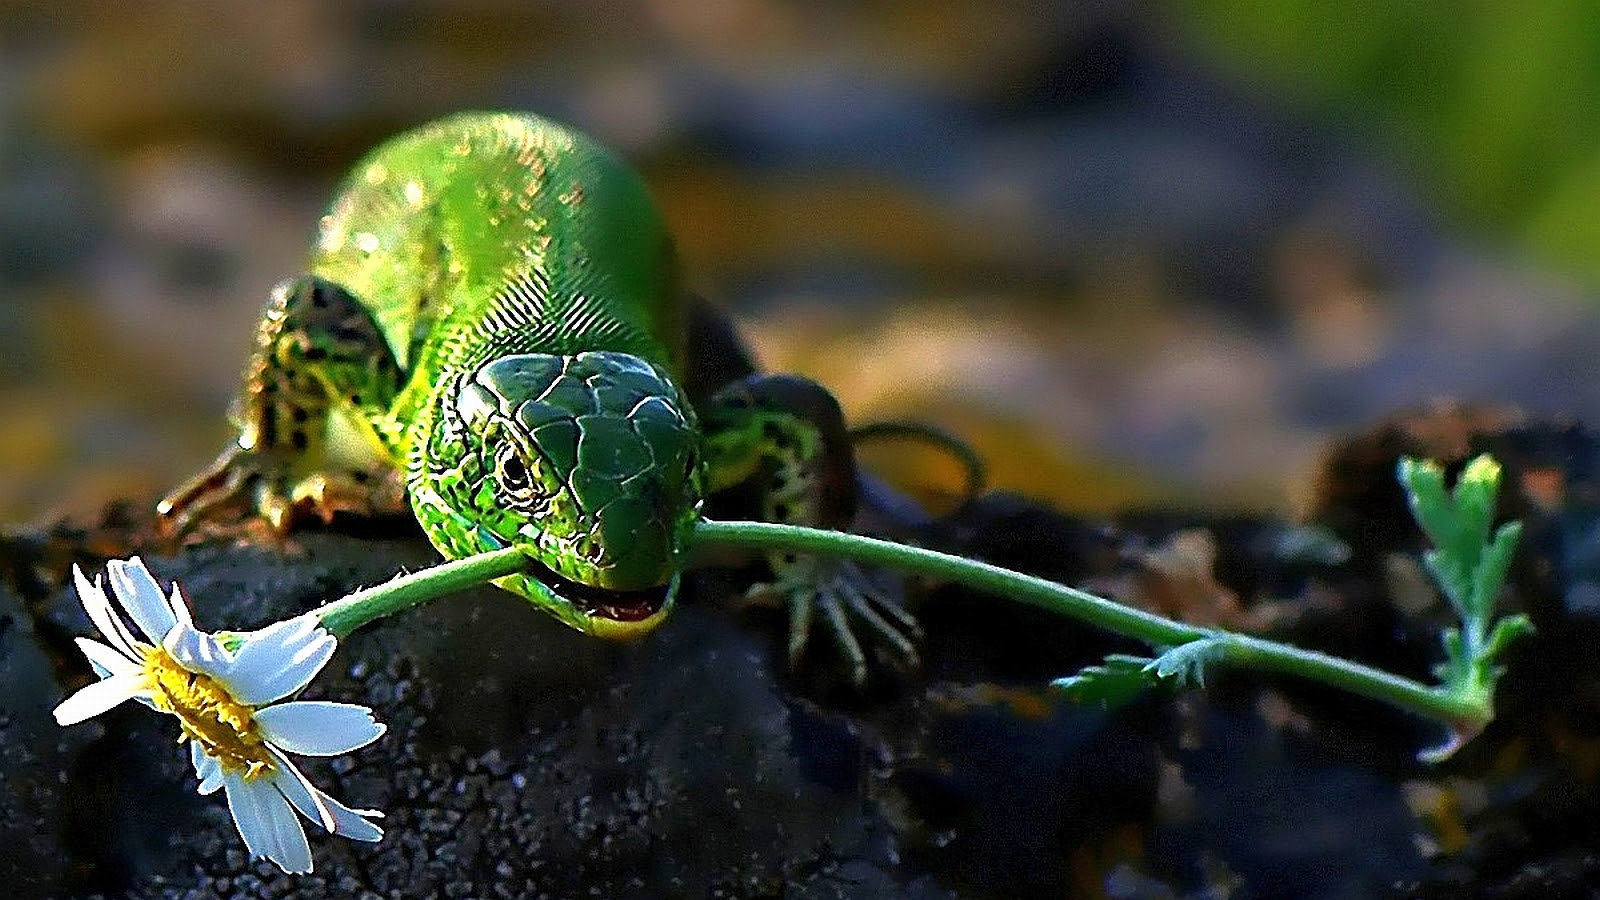 Lizard lizards Wallpaper 40750920 Fanpop